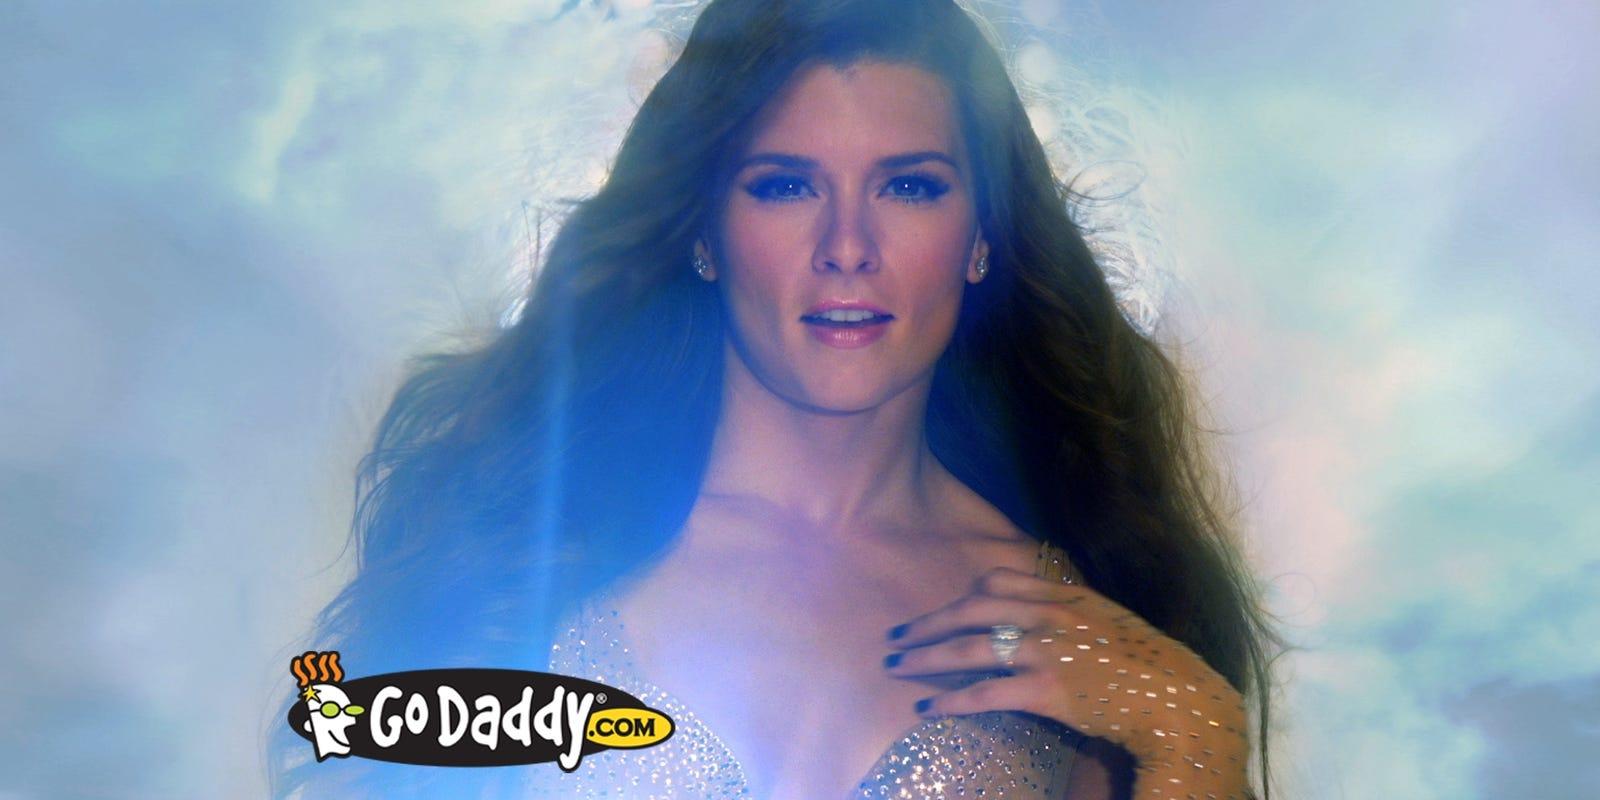 Go Daddy sued over revenge-porn site 3ce237dd9